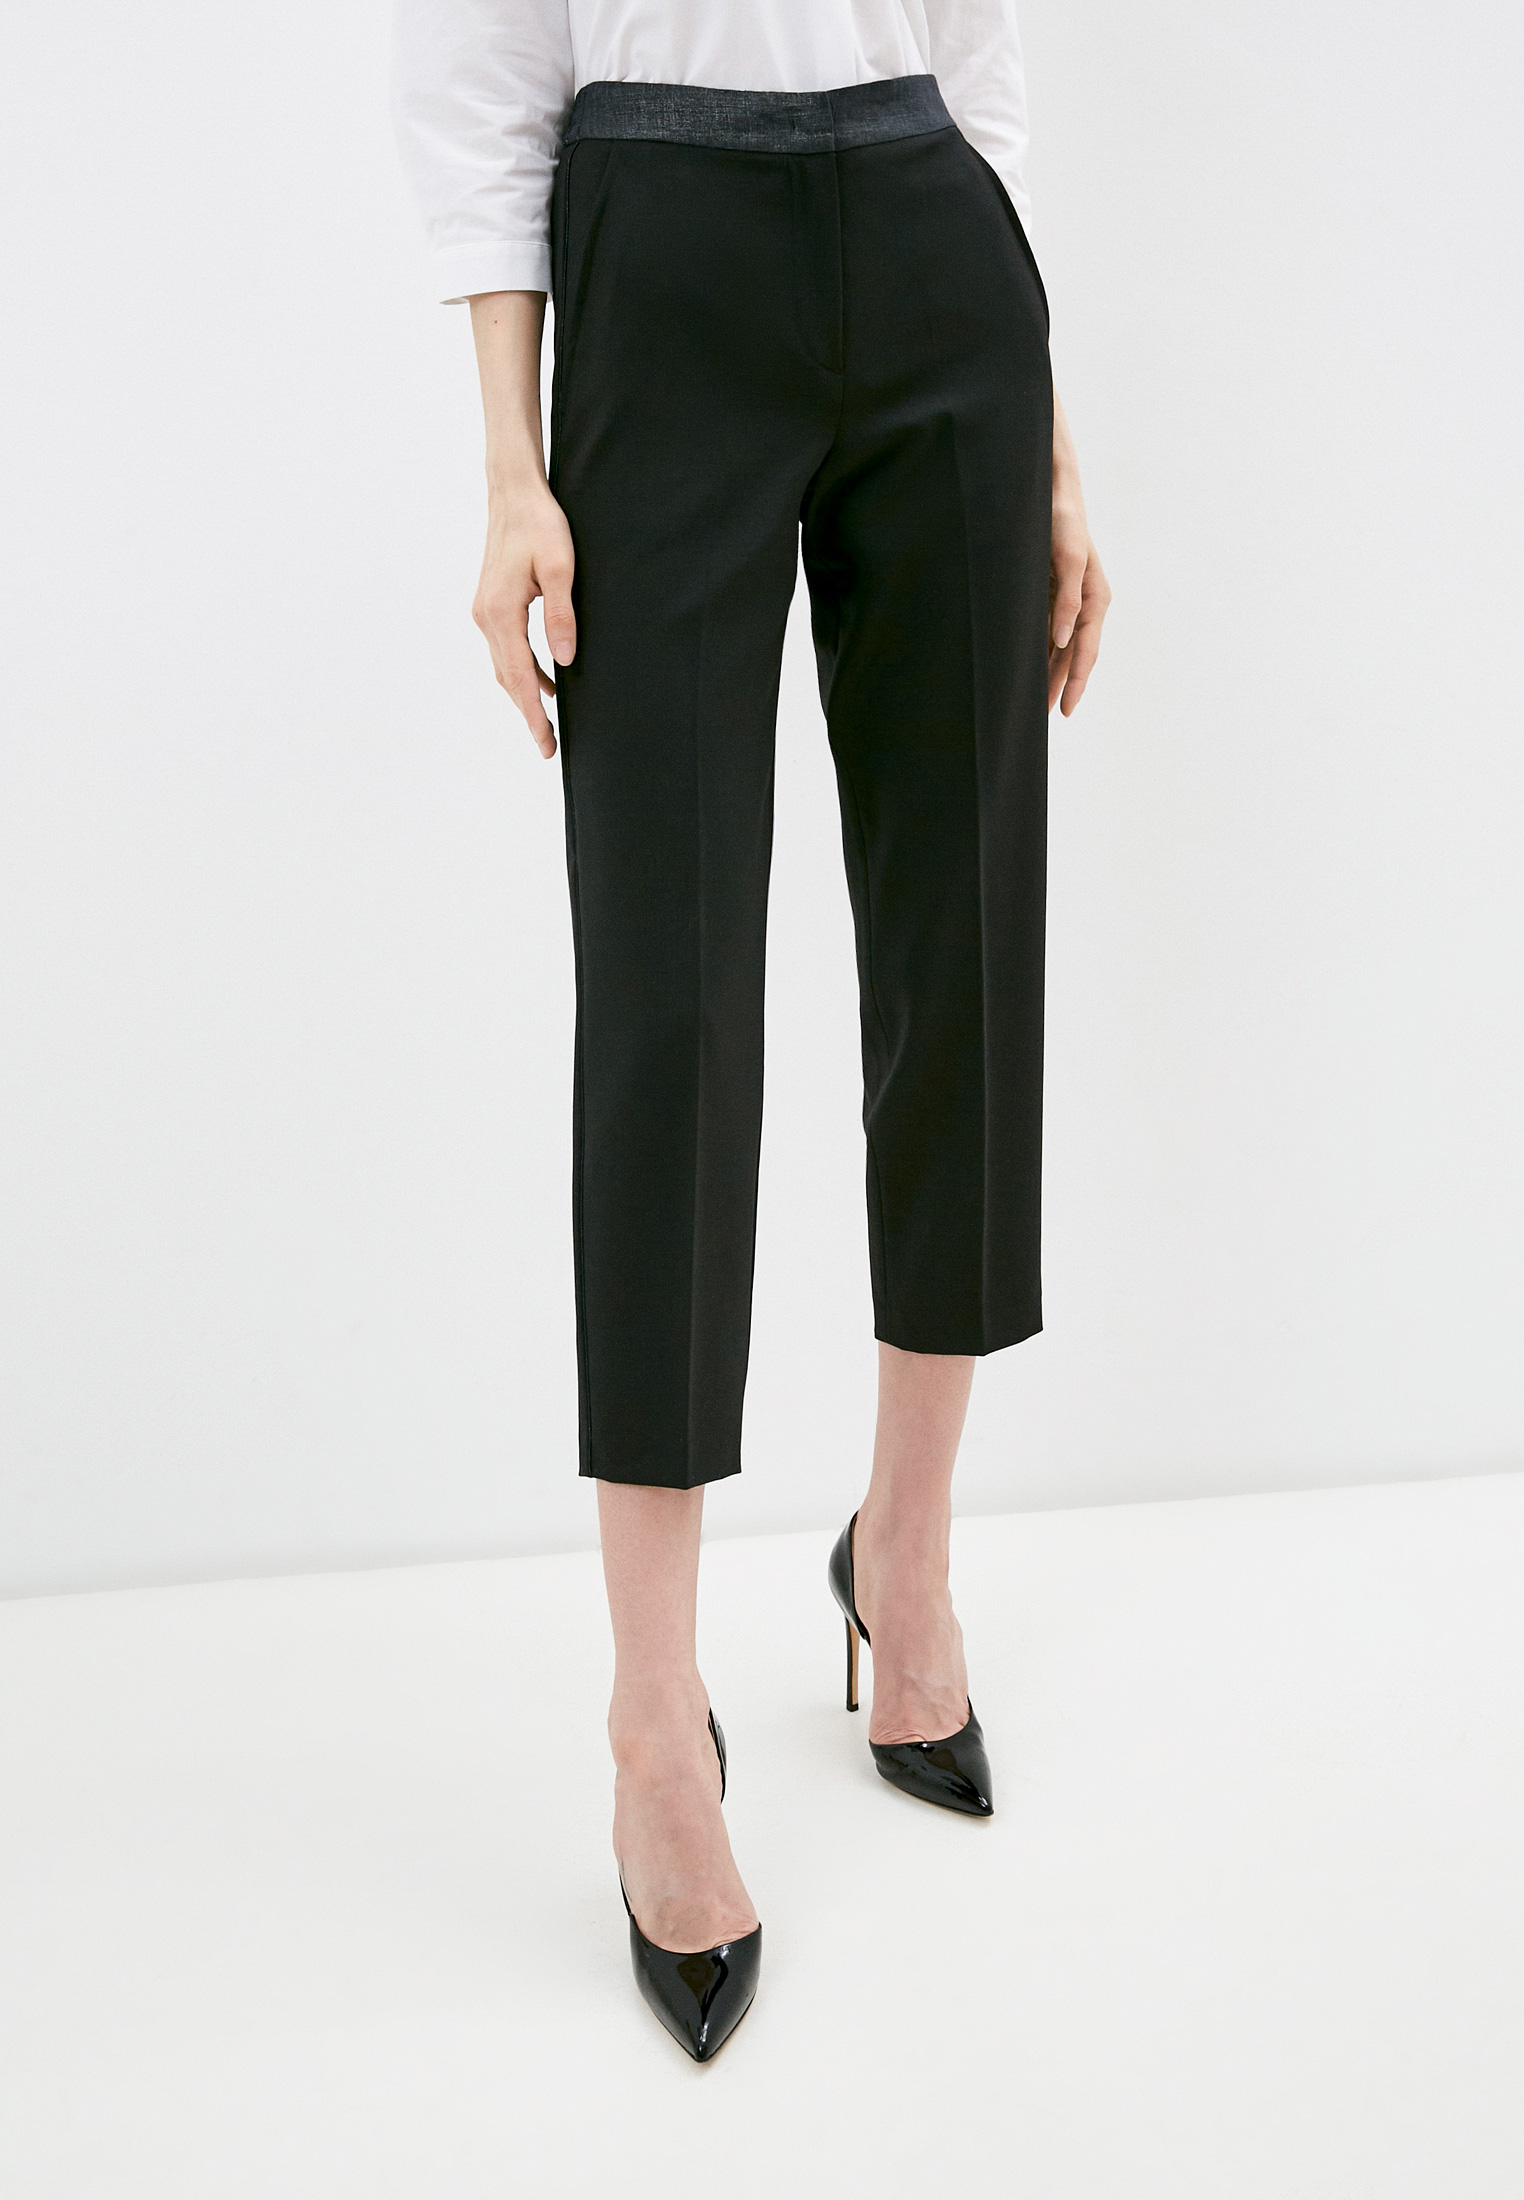 Женские классические брюки Seventy Брюки Seventy